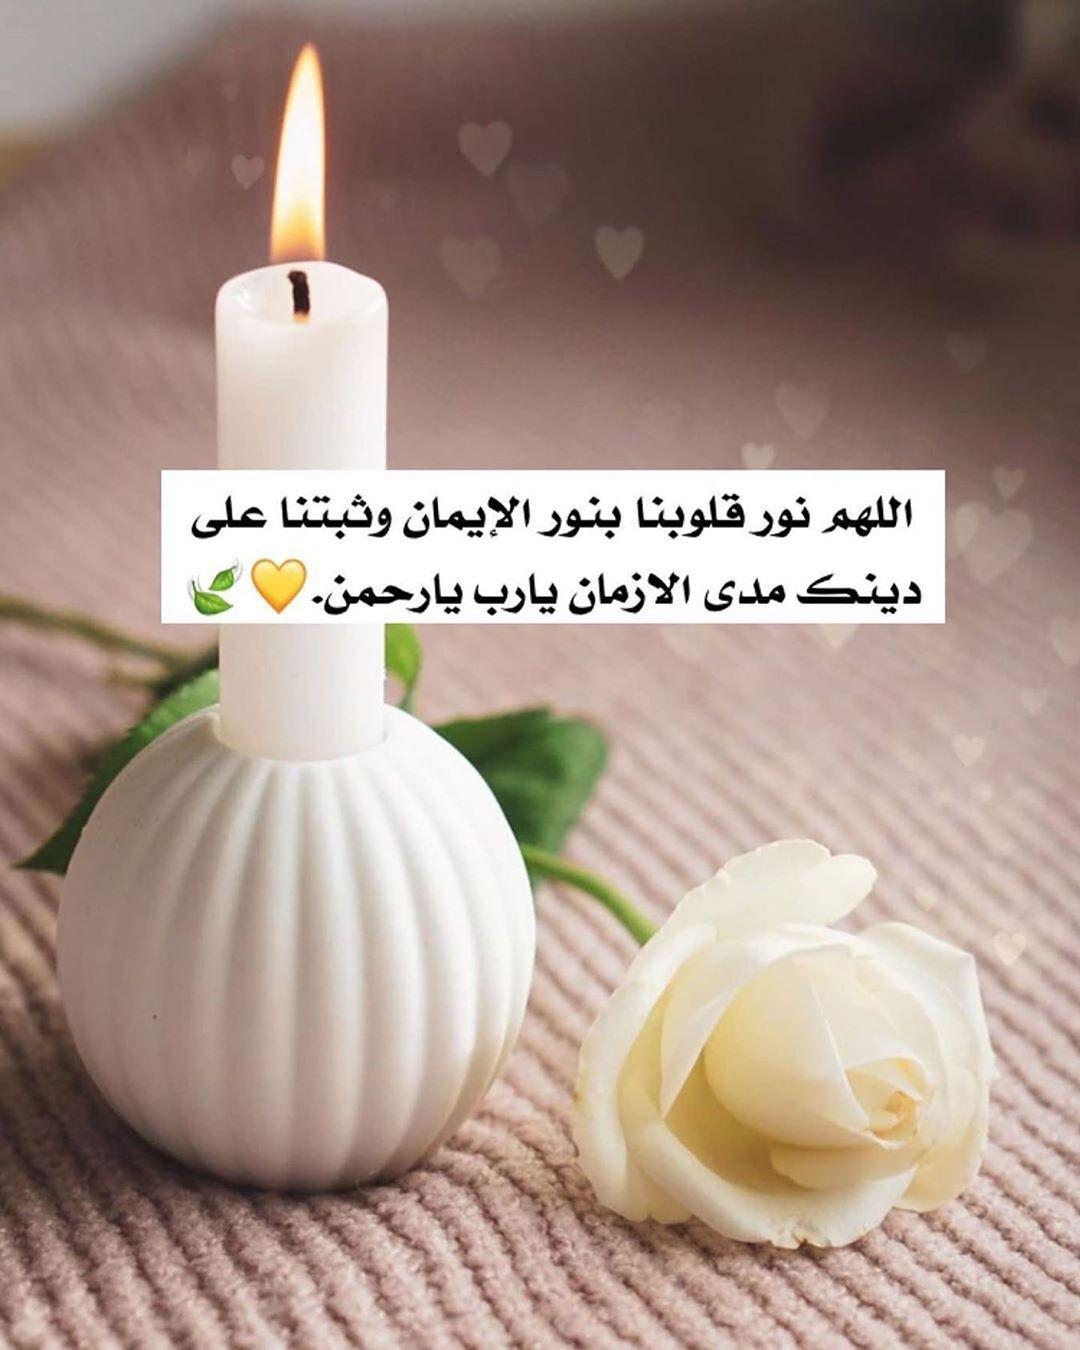 Palamrm5433 On Instagram أذكار إسلامية ديني دين اسلام اسلامي هاشتاق اذكار صور رمزيات خلفيات تذكير دنيا الاخرة ا Candles Flameless Candle